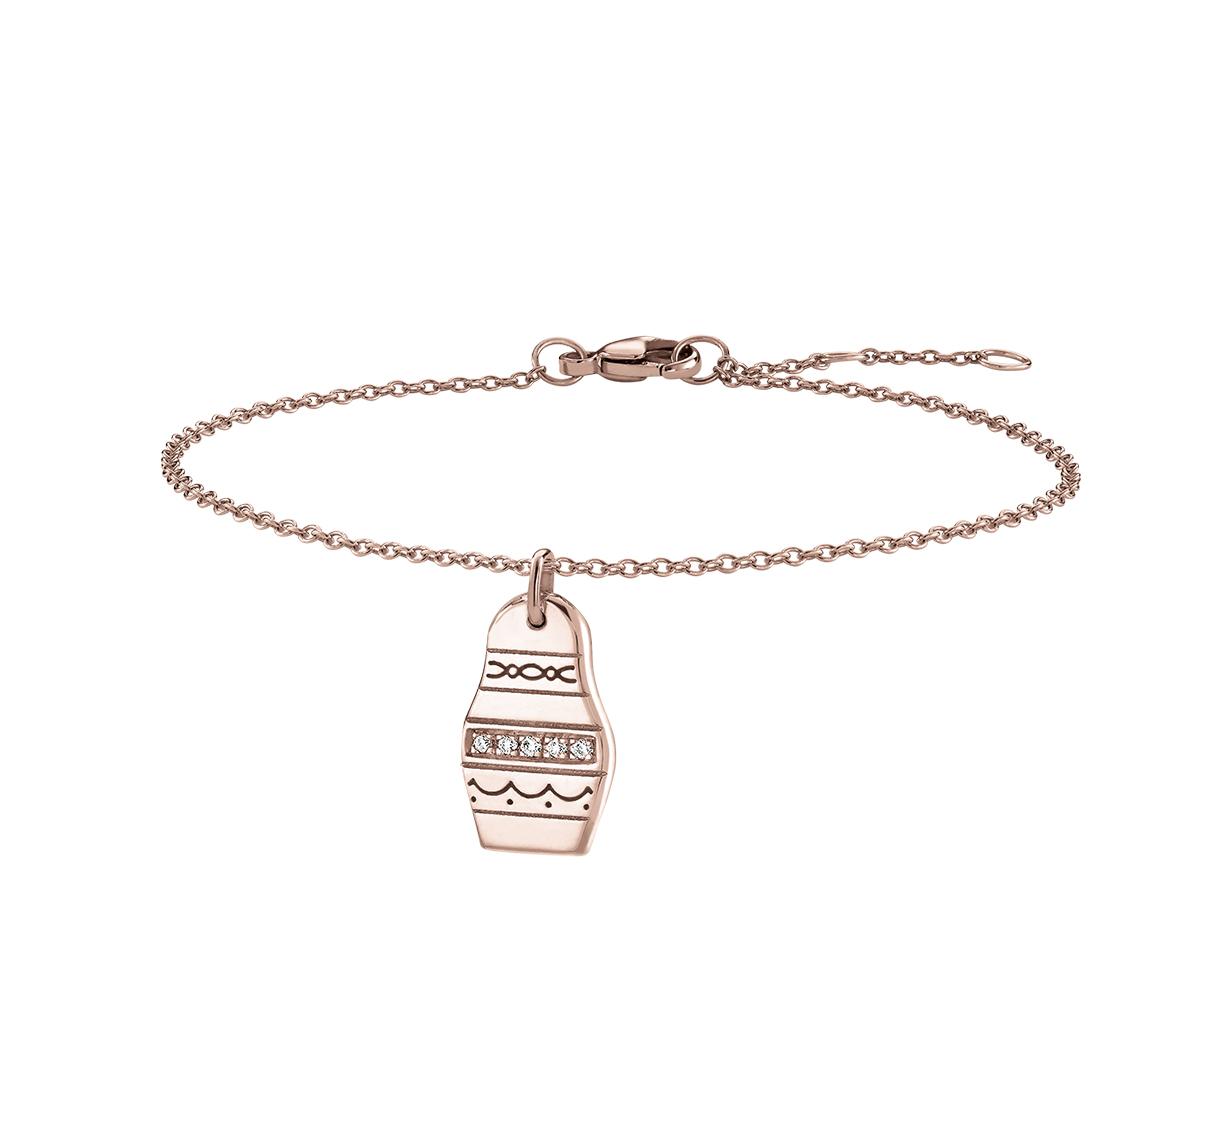 Bracelet Jolie Poupée : Bracelet Jolie Poupée